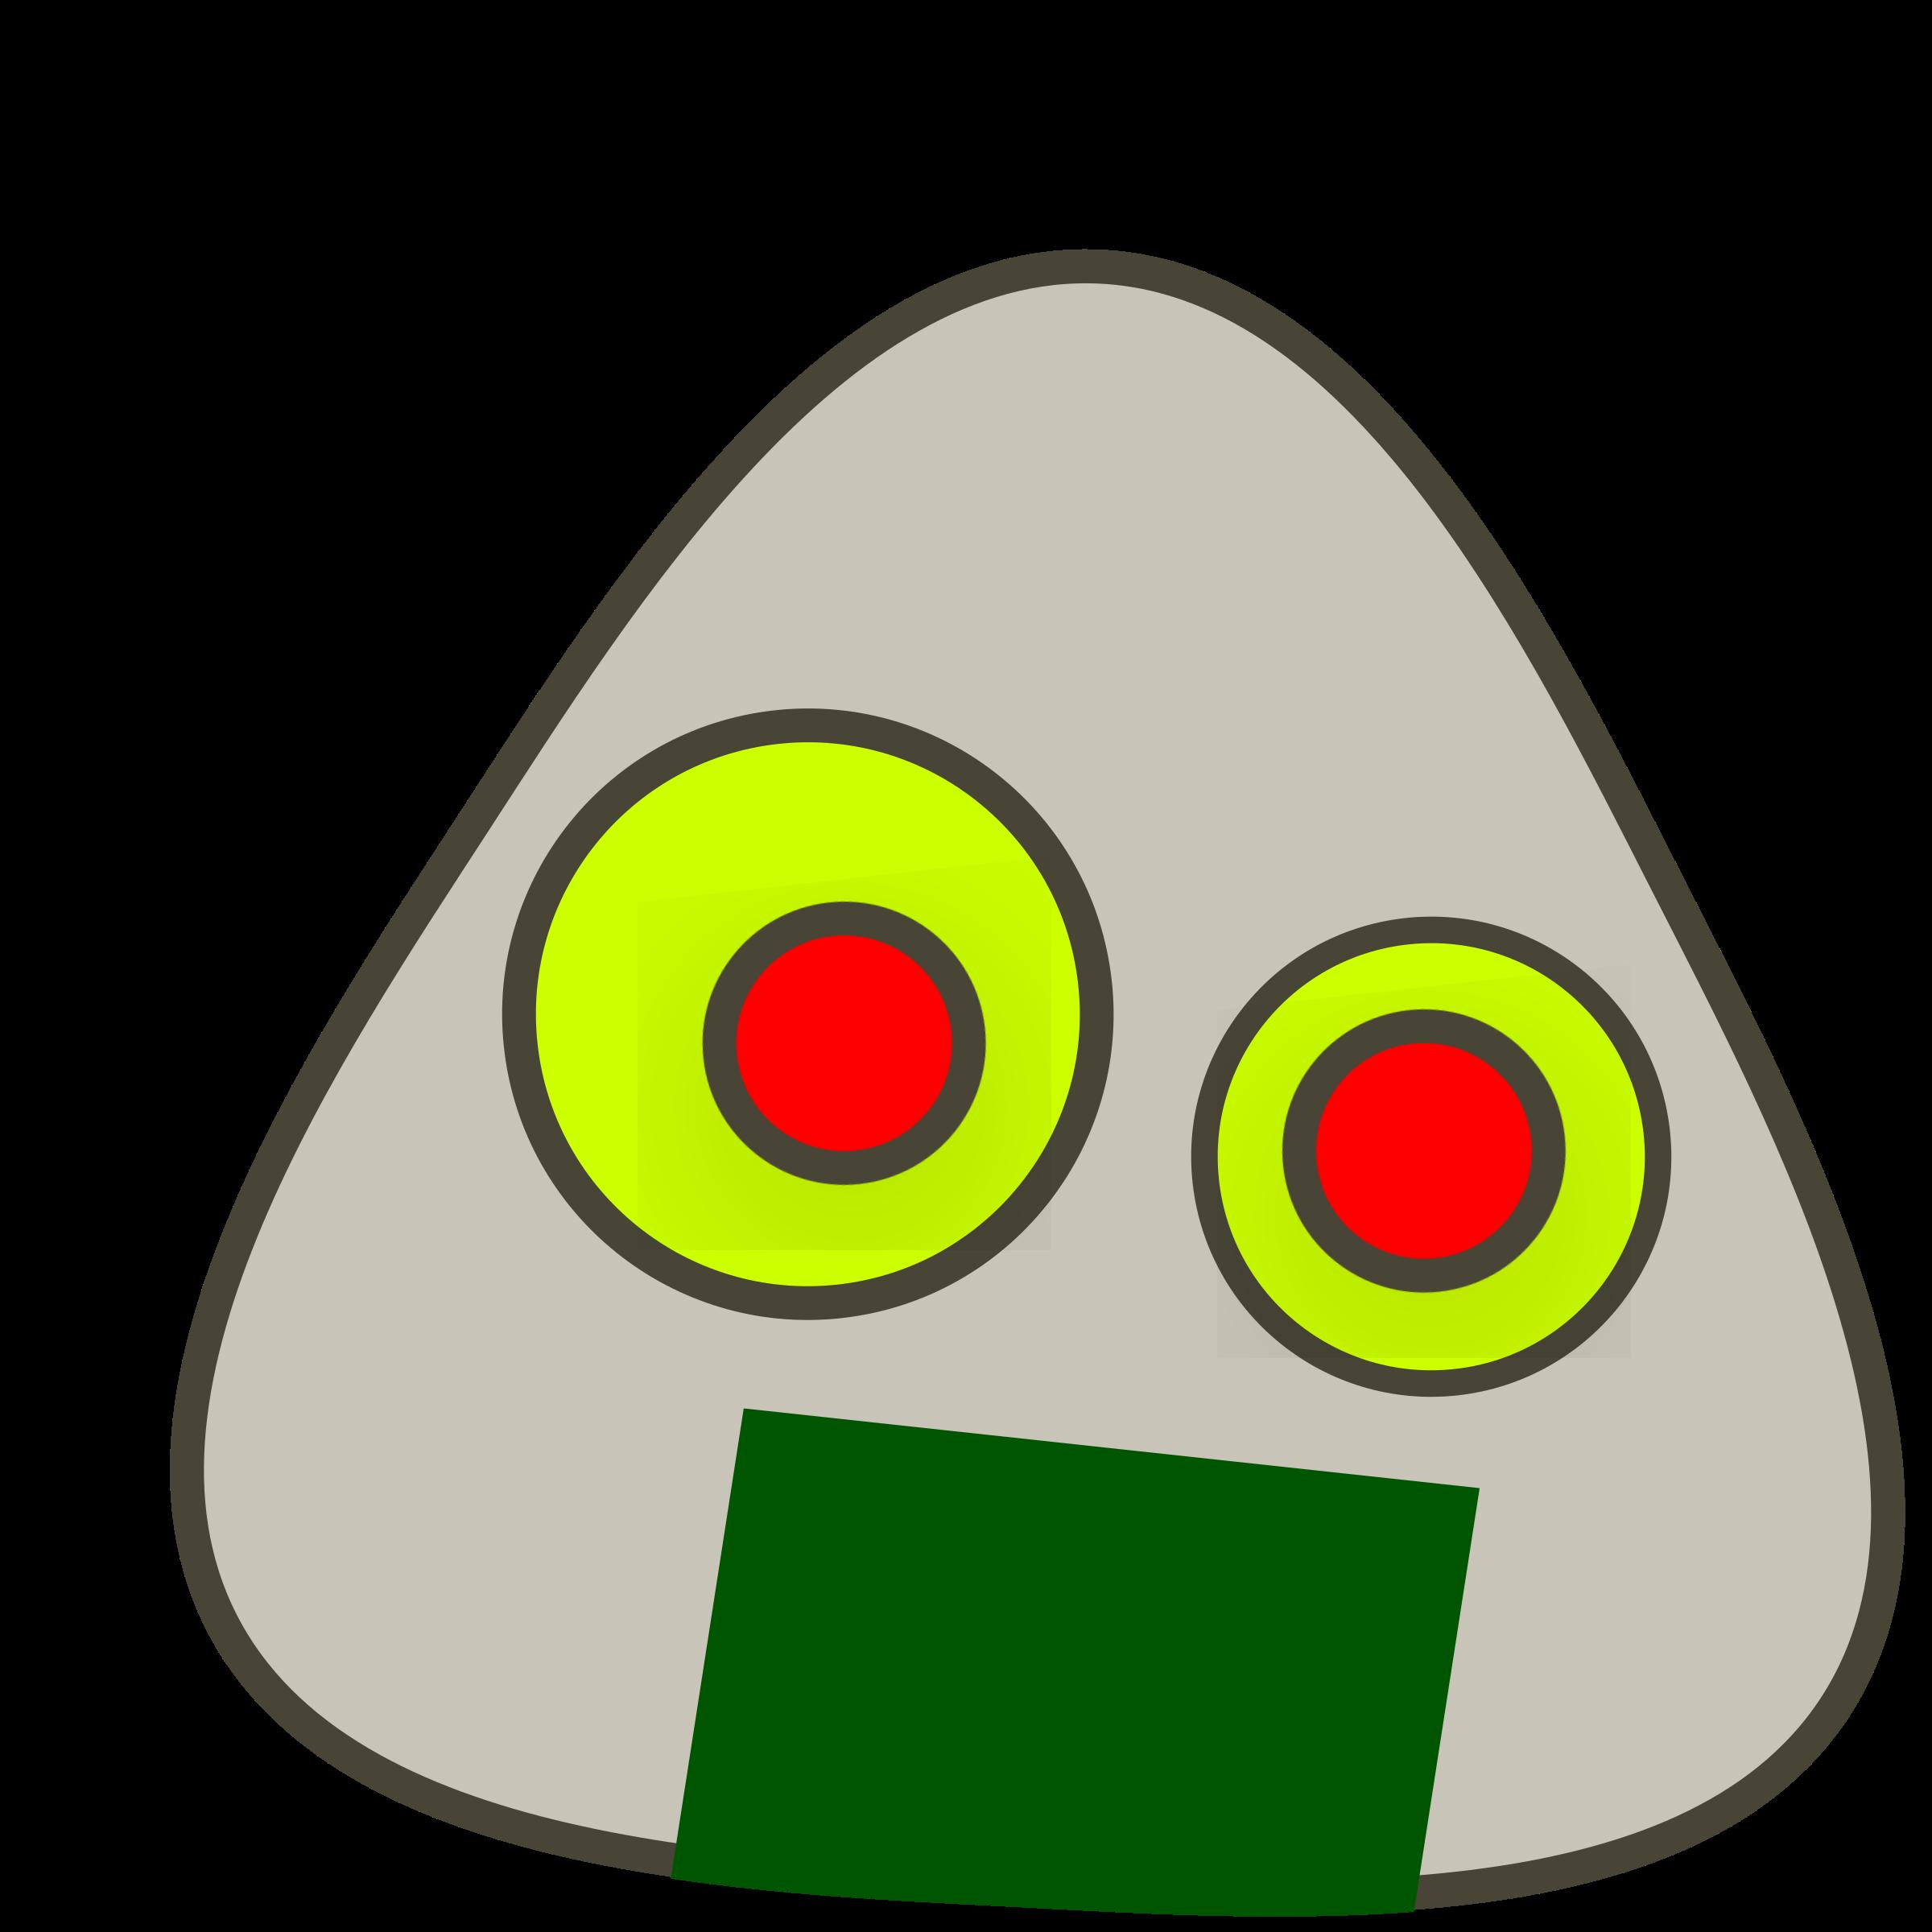 Onigiri clipart Face Onigiri Clipart ball Onigiri